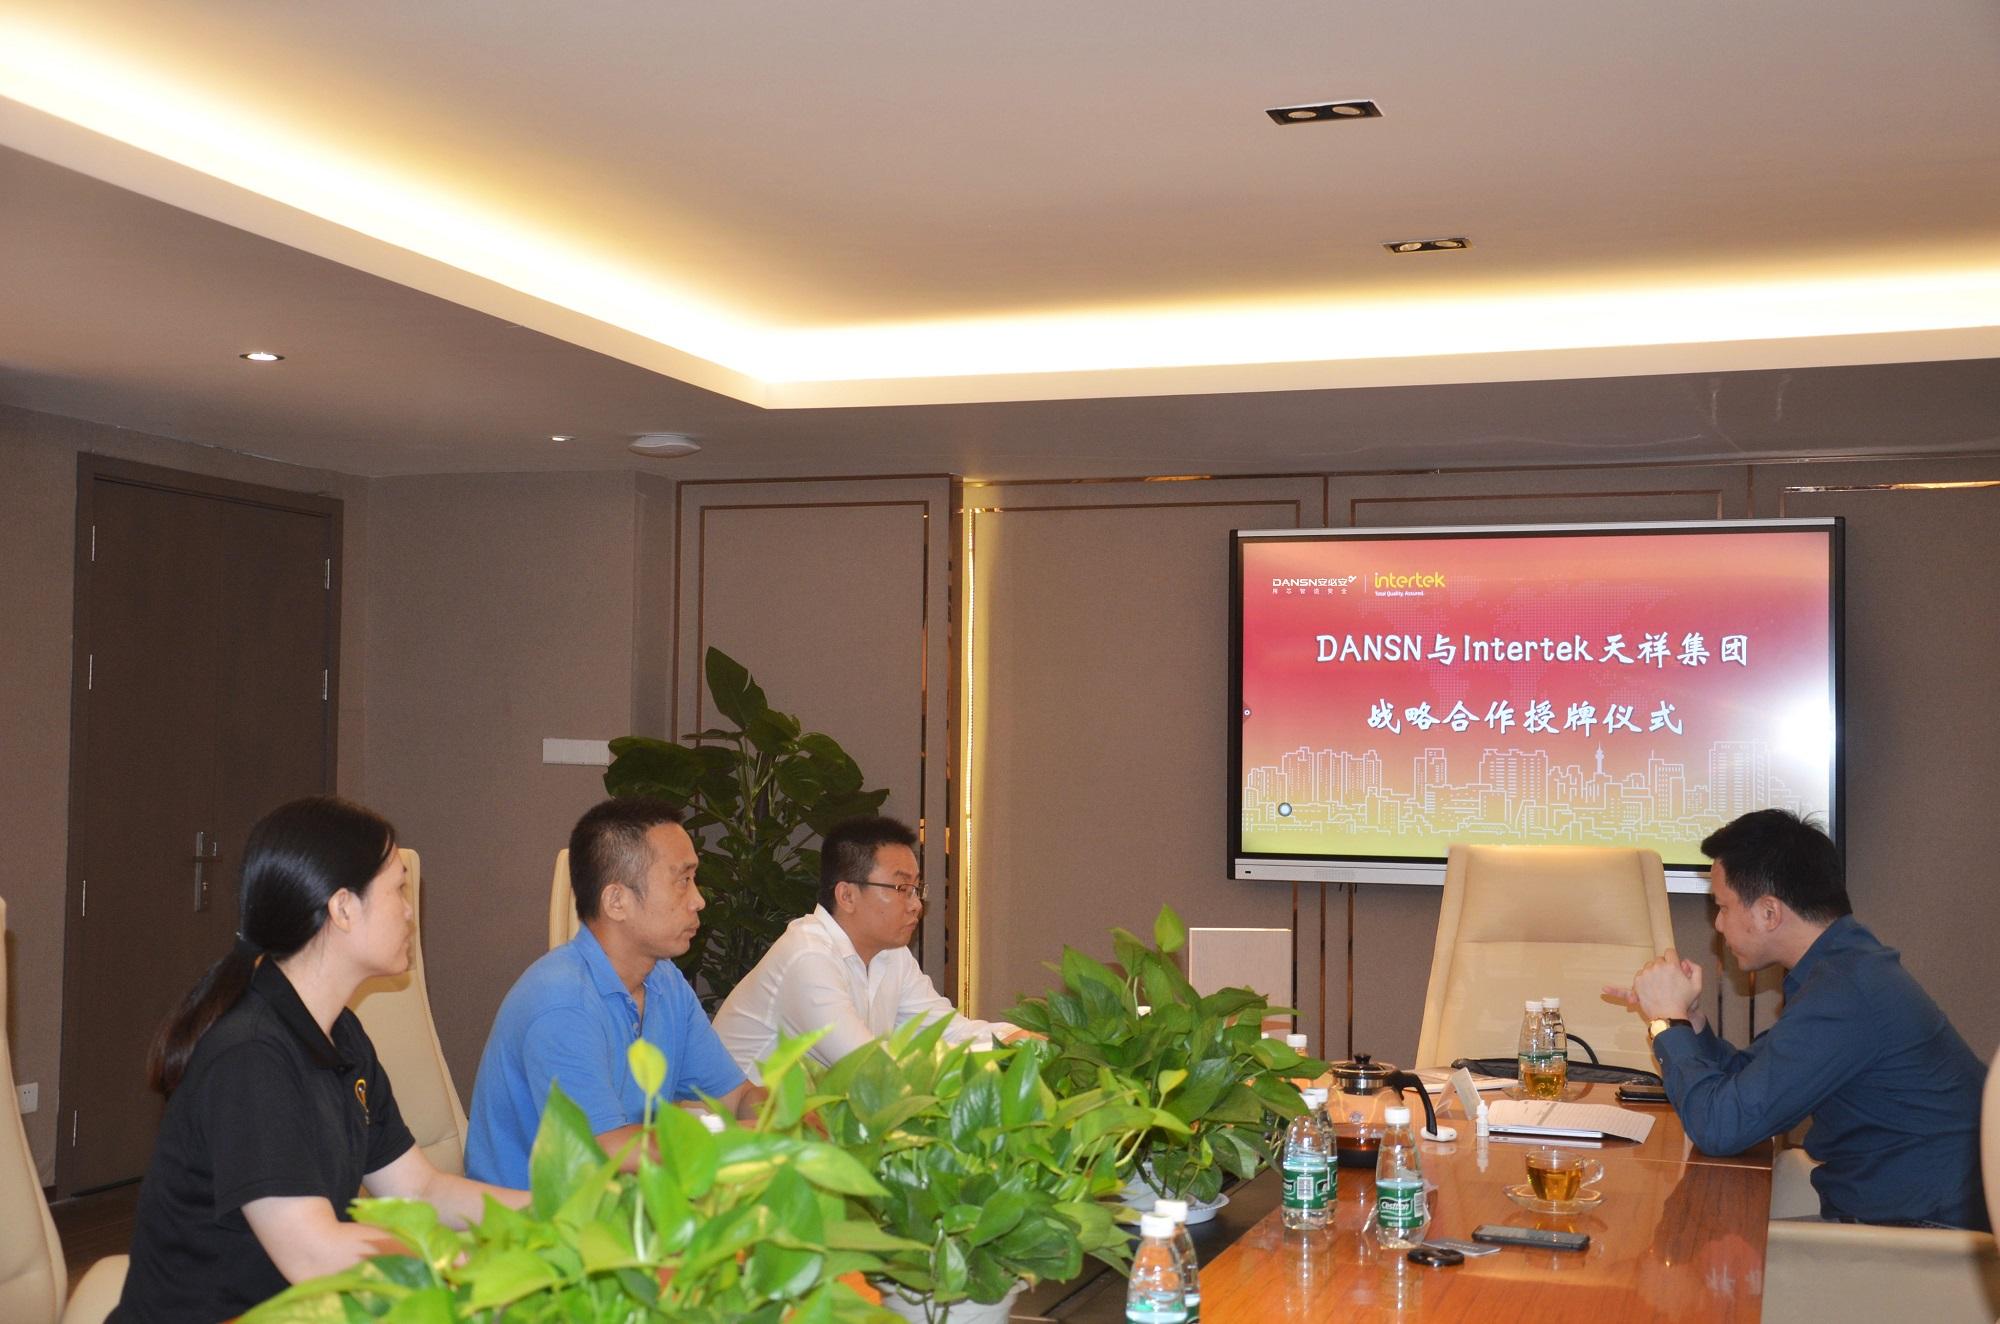 DANSN Cooperates with Intertek in Global Certification Service